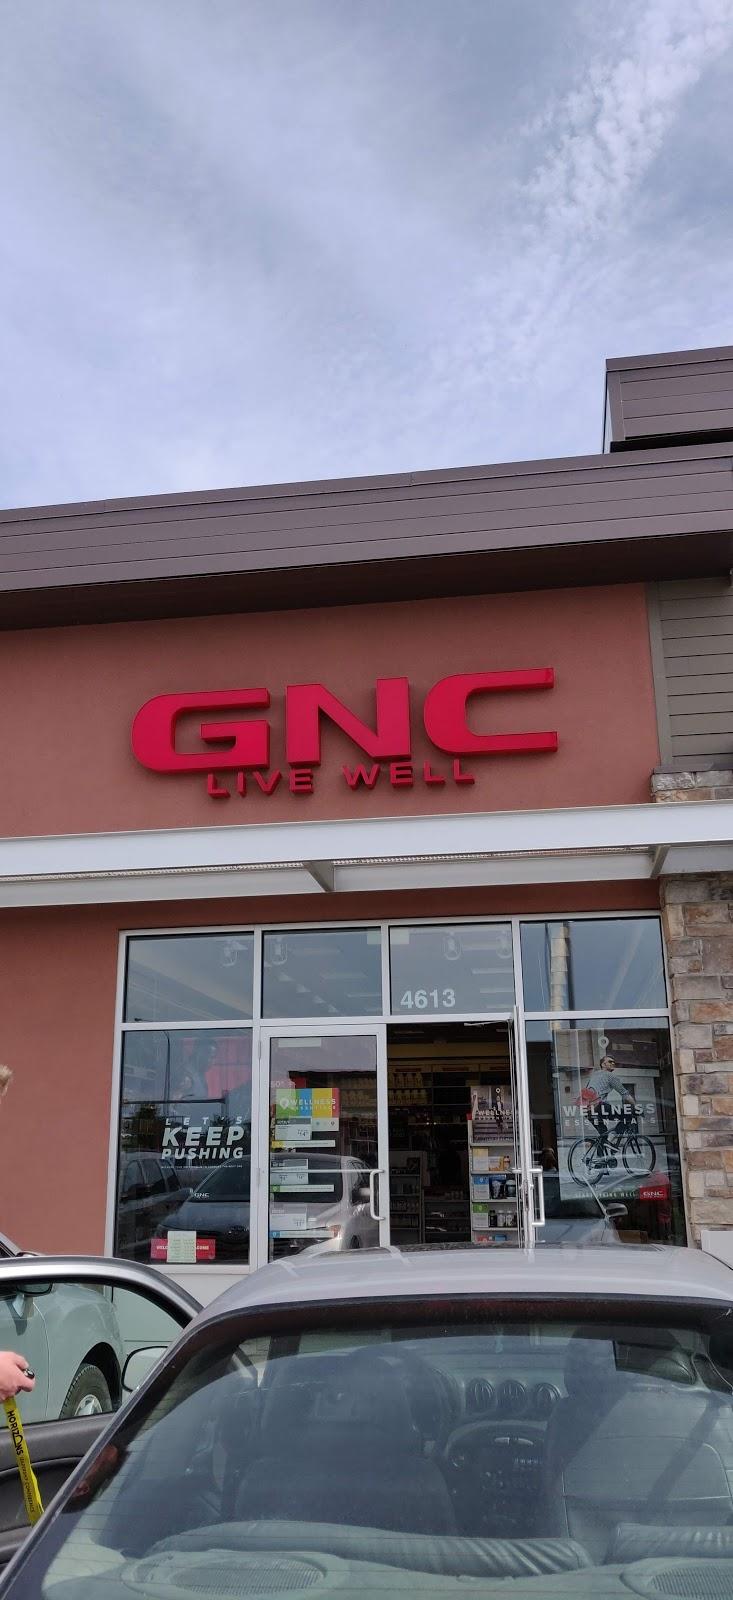 GNC - General Nutrition Centres   health   4613 Gordon Rd #38, Regina, SK S4W 0B7, Canada   3065852277 OR +1 306-585-2277